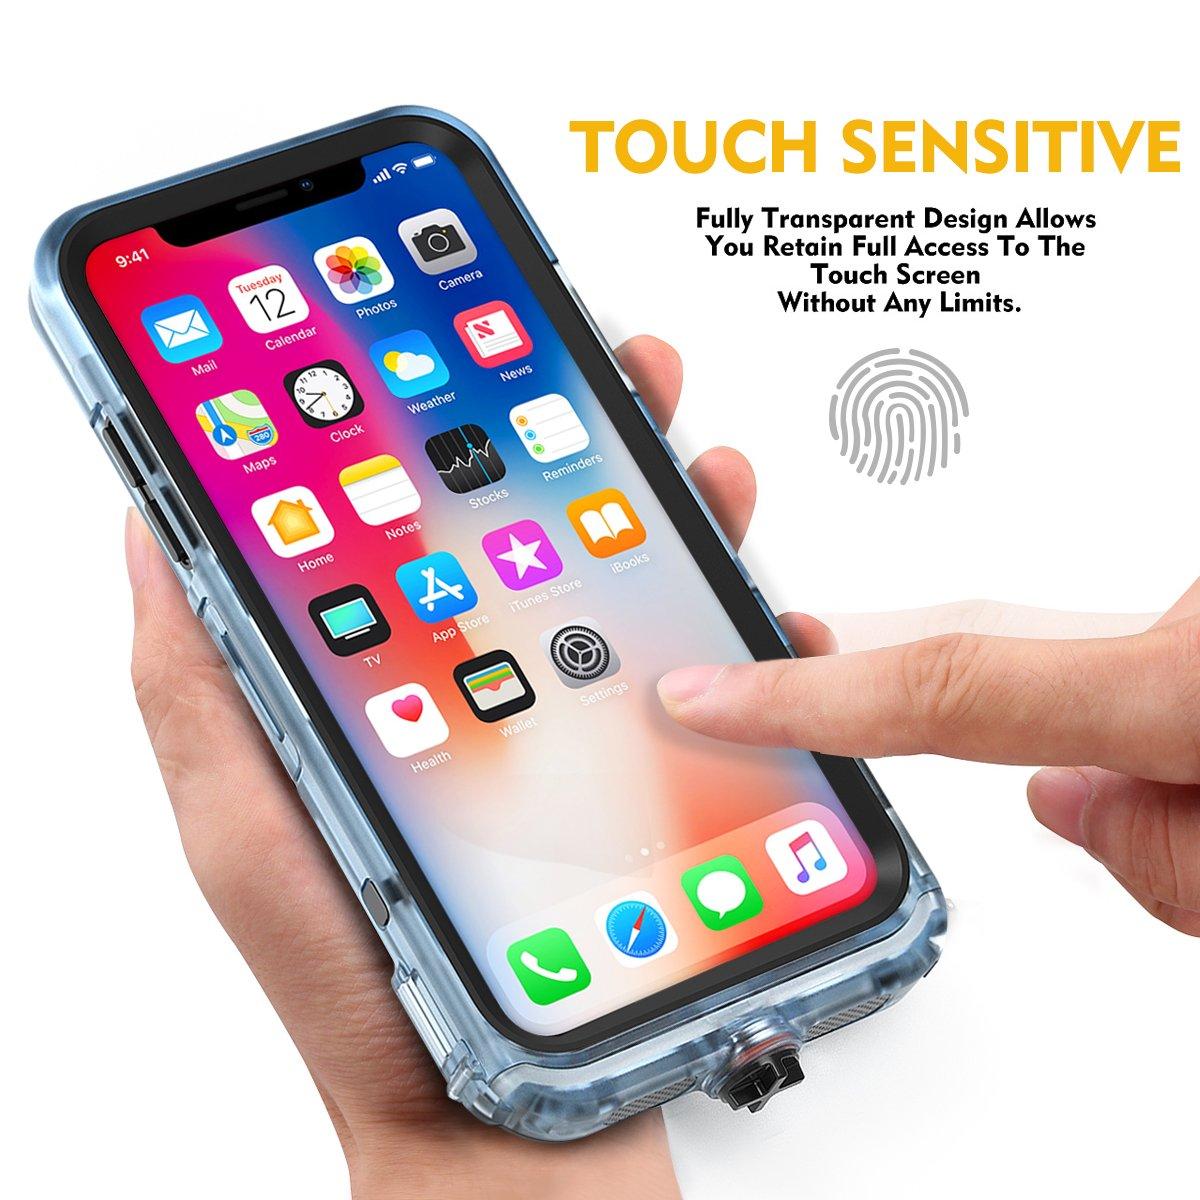 Cornmi iPhone X Waterproof Case, Full Sealed IP68 Certified Waterproof Shockproof Snowproof Protection Underwater Case for iPhone X 5.2inch (Black) by Cornmi (Image #3)